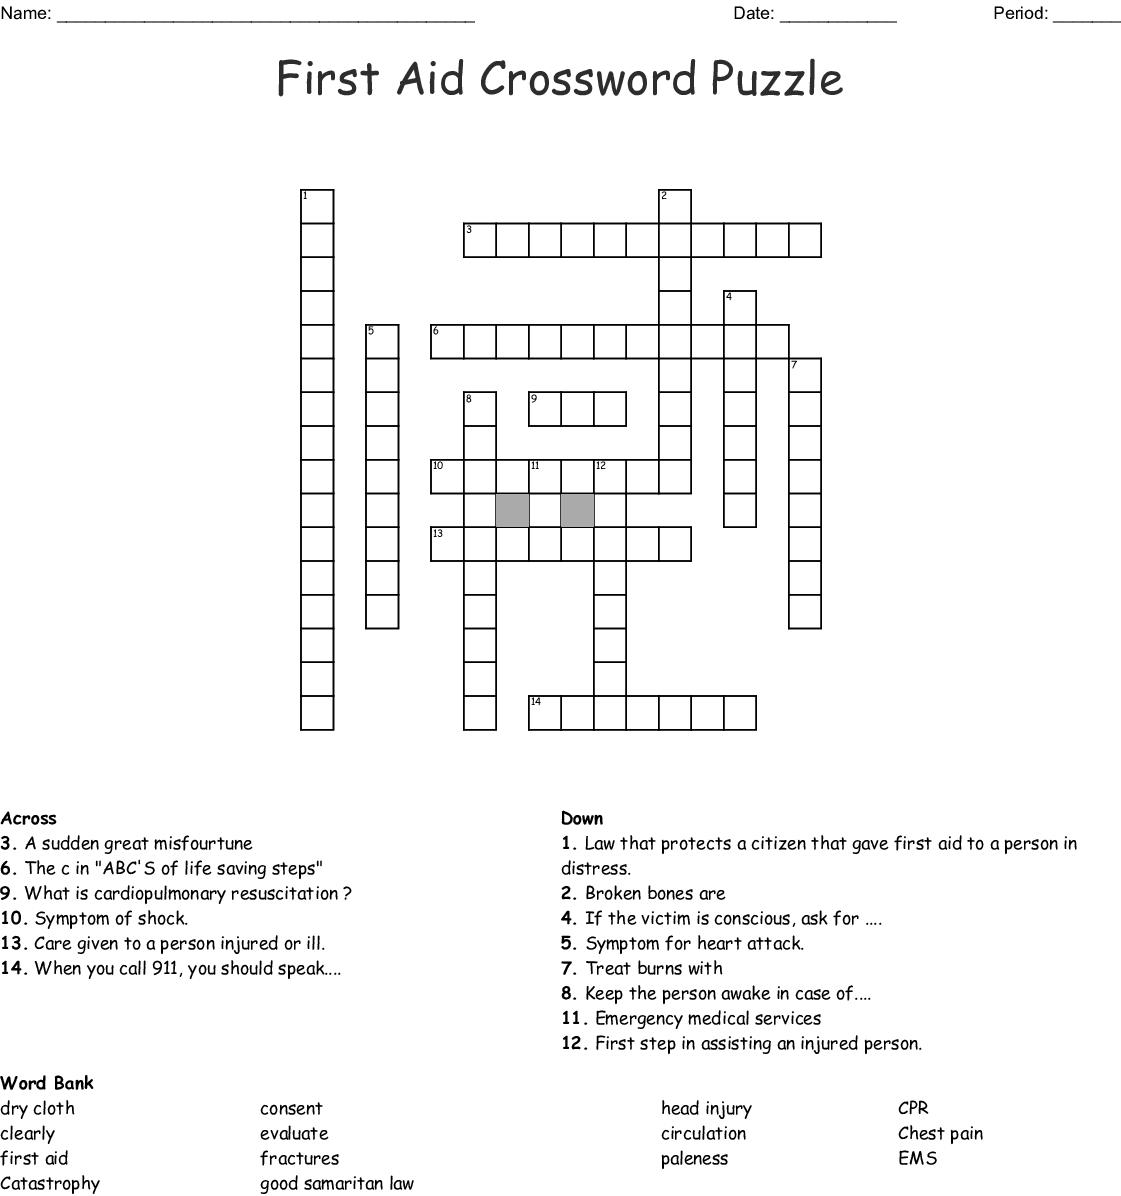 First Aid Crossword Puzzle Crossword - Wordmint - Printable Crossword Puzzle First Aid